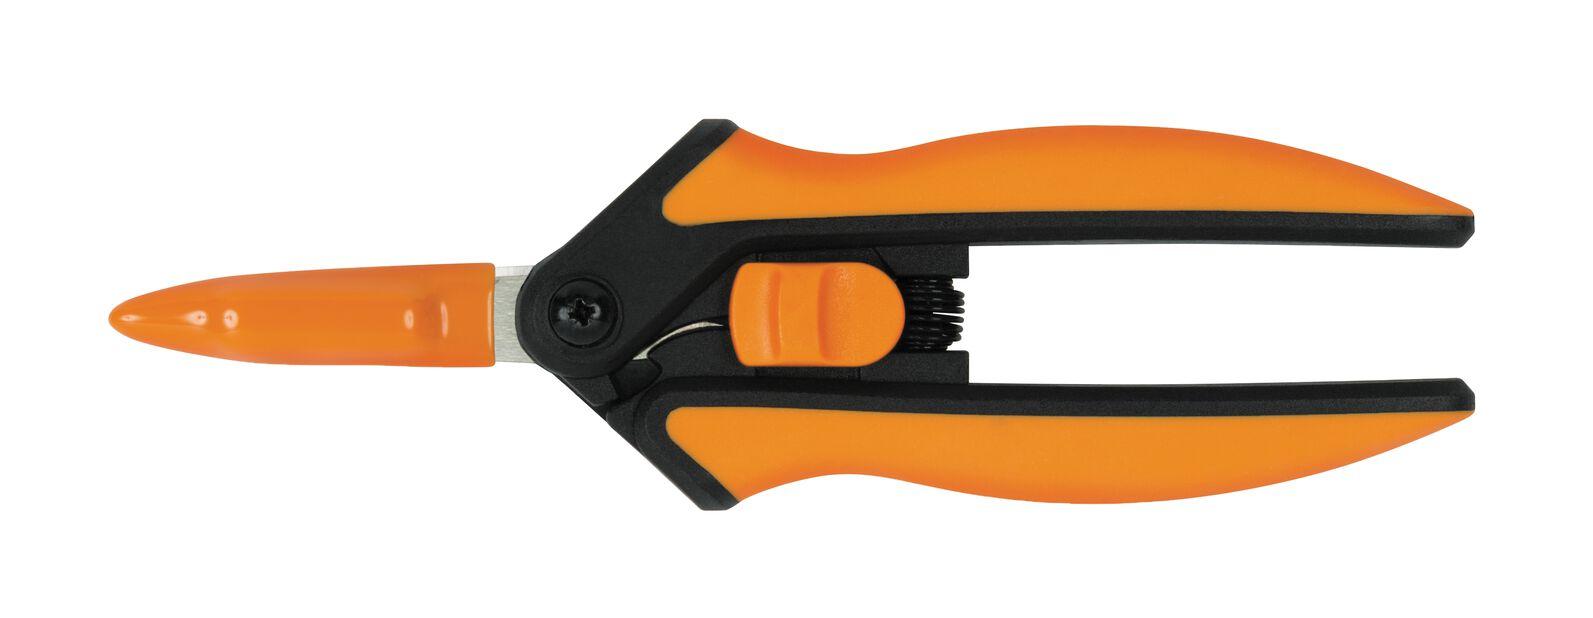 Solid Snip microtip sakset SP13 Fiskars, Pituus 24 cm, Oranssi